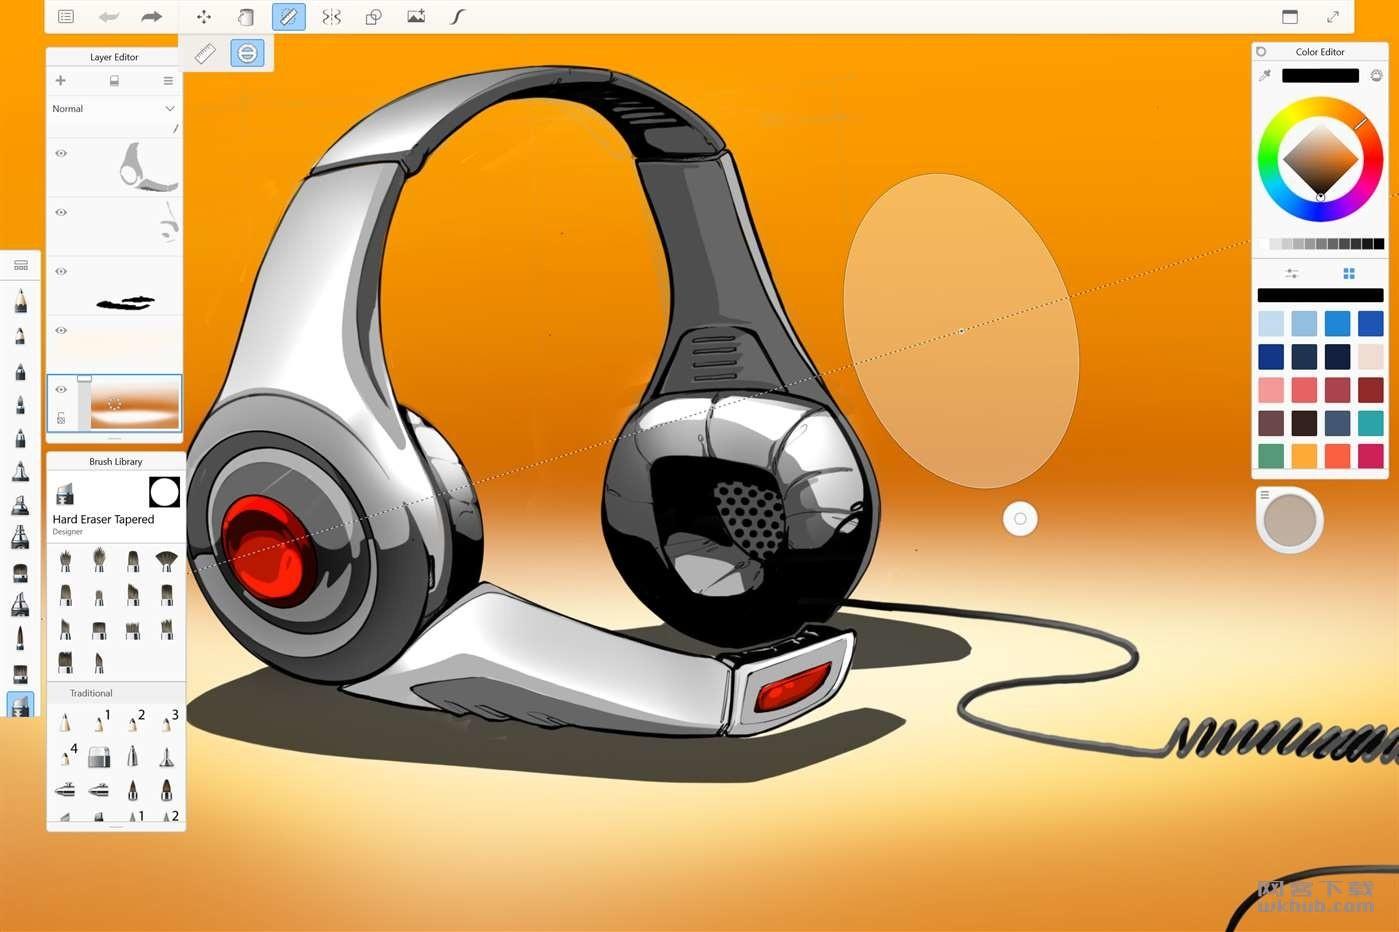 Autodesk SketchBook Pro 2018 可能是最好用的绘图软件之一